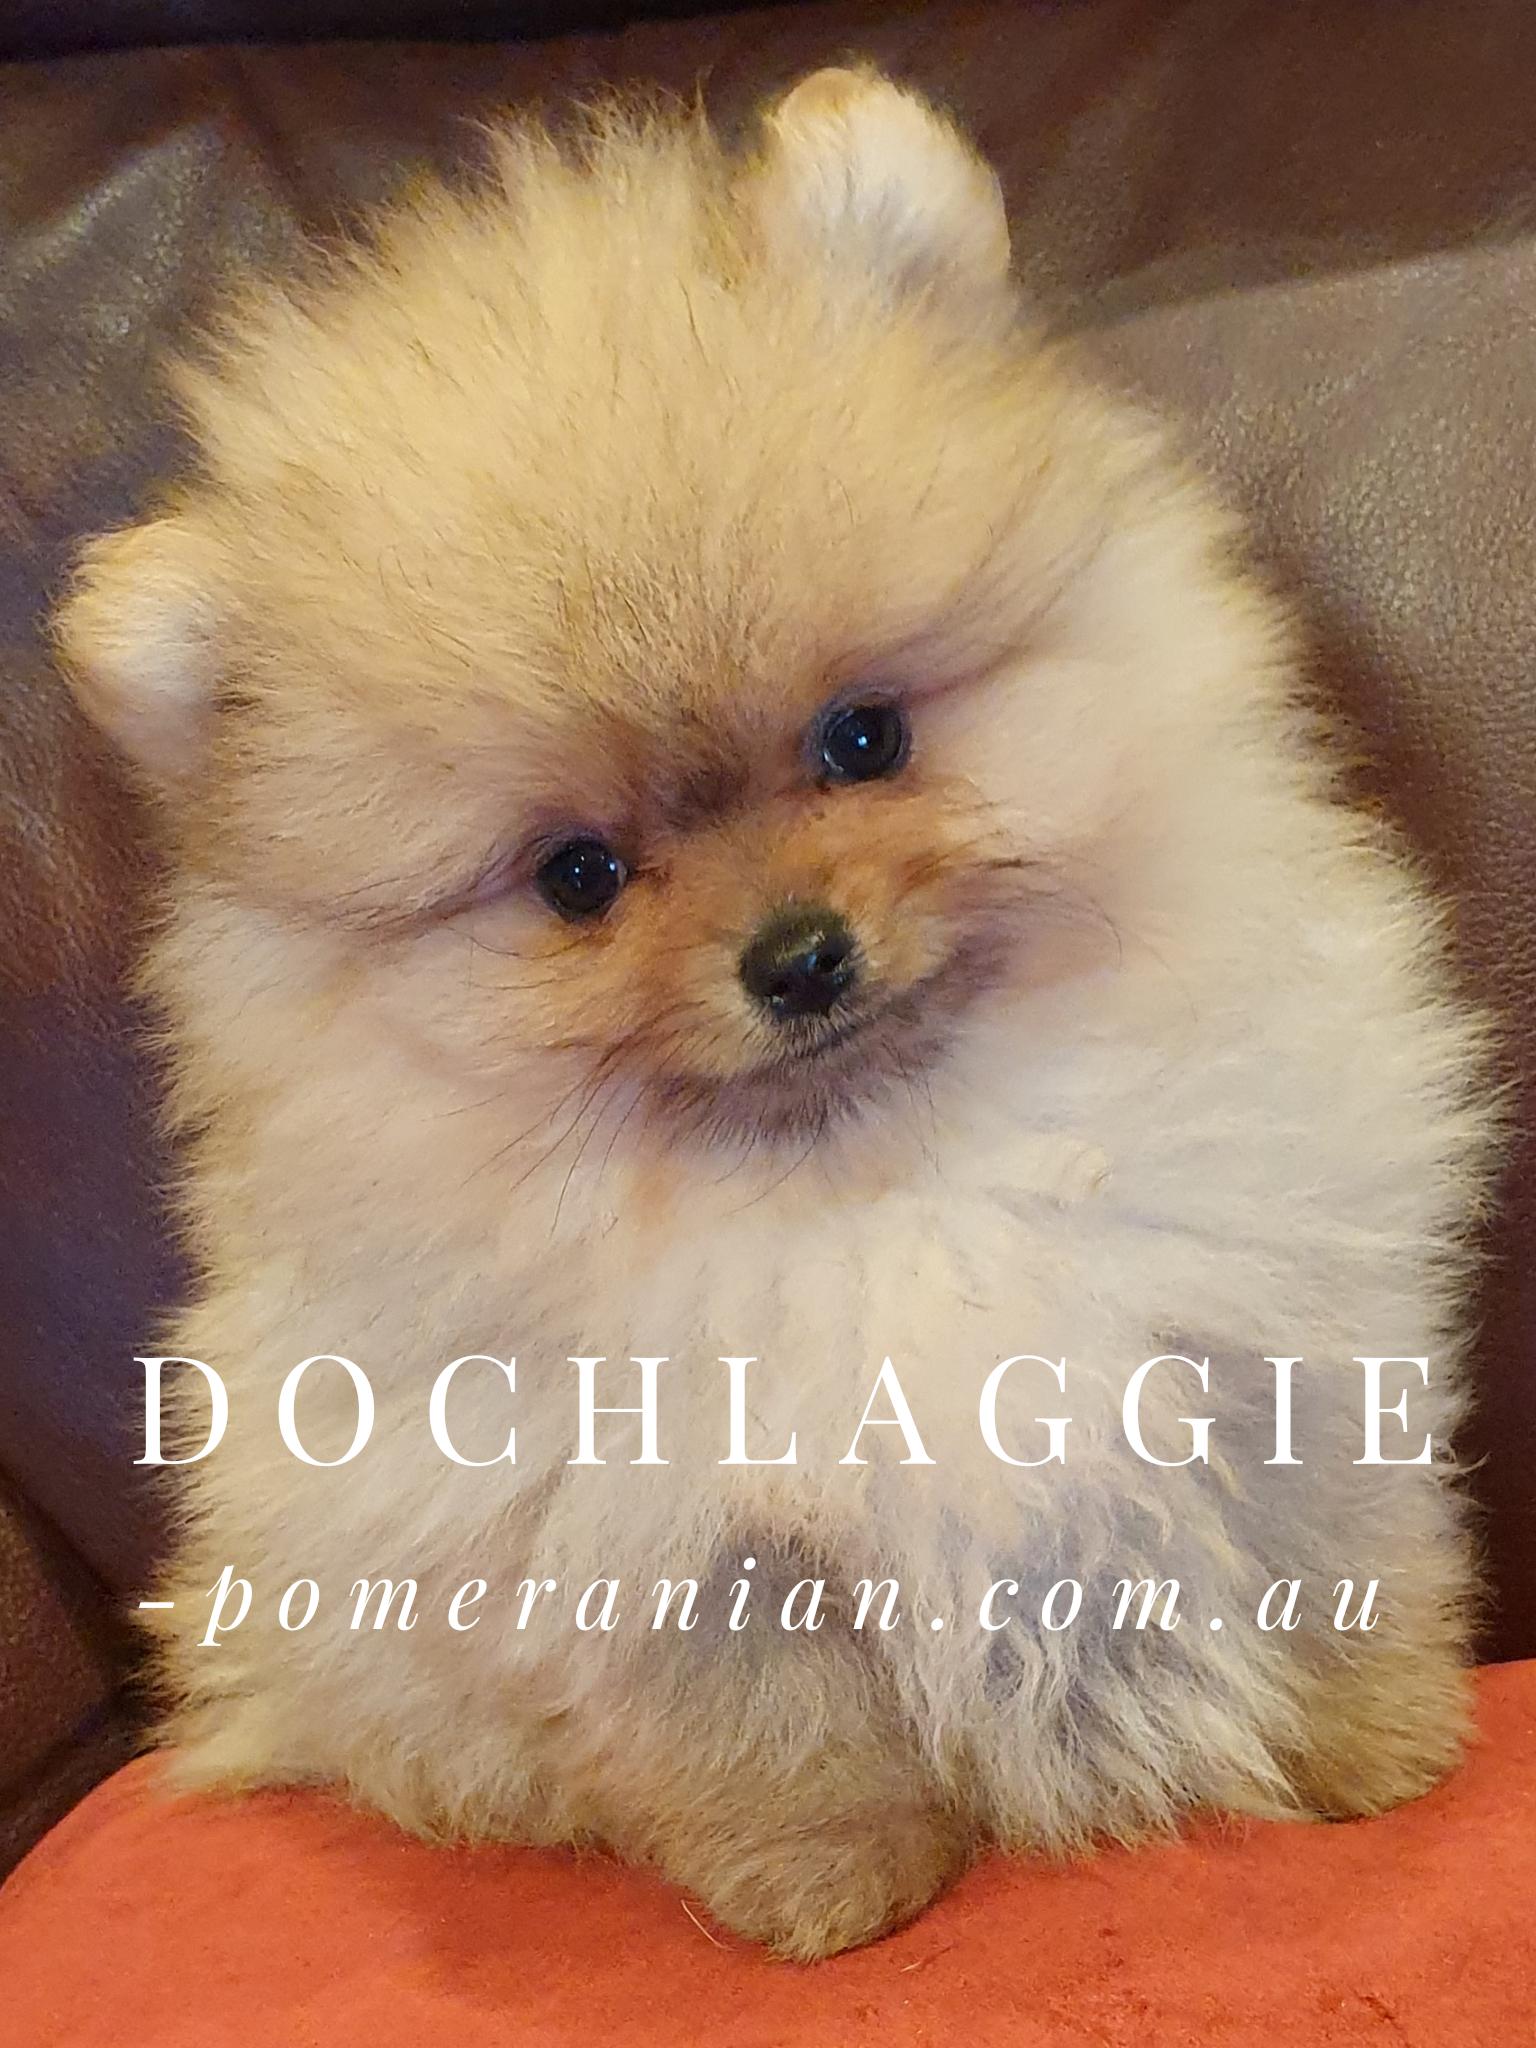 Supreme Champion Dochlaggie Dragon Double Pomeranian Puppy Puppies Pomeranian